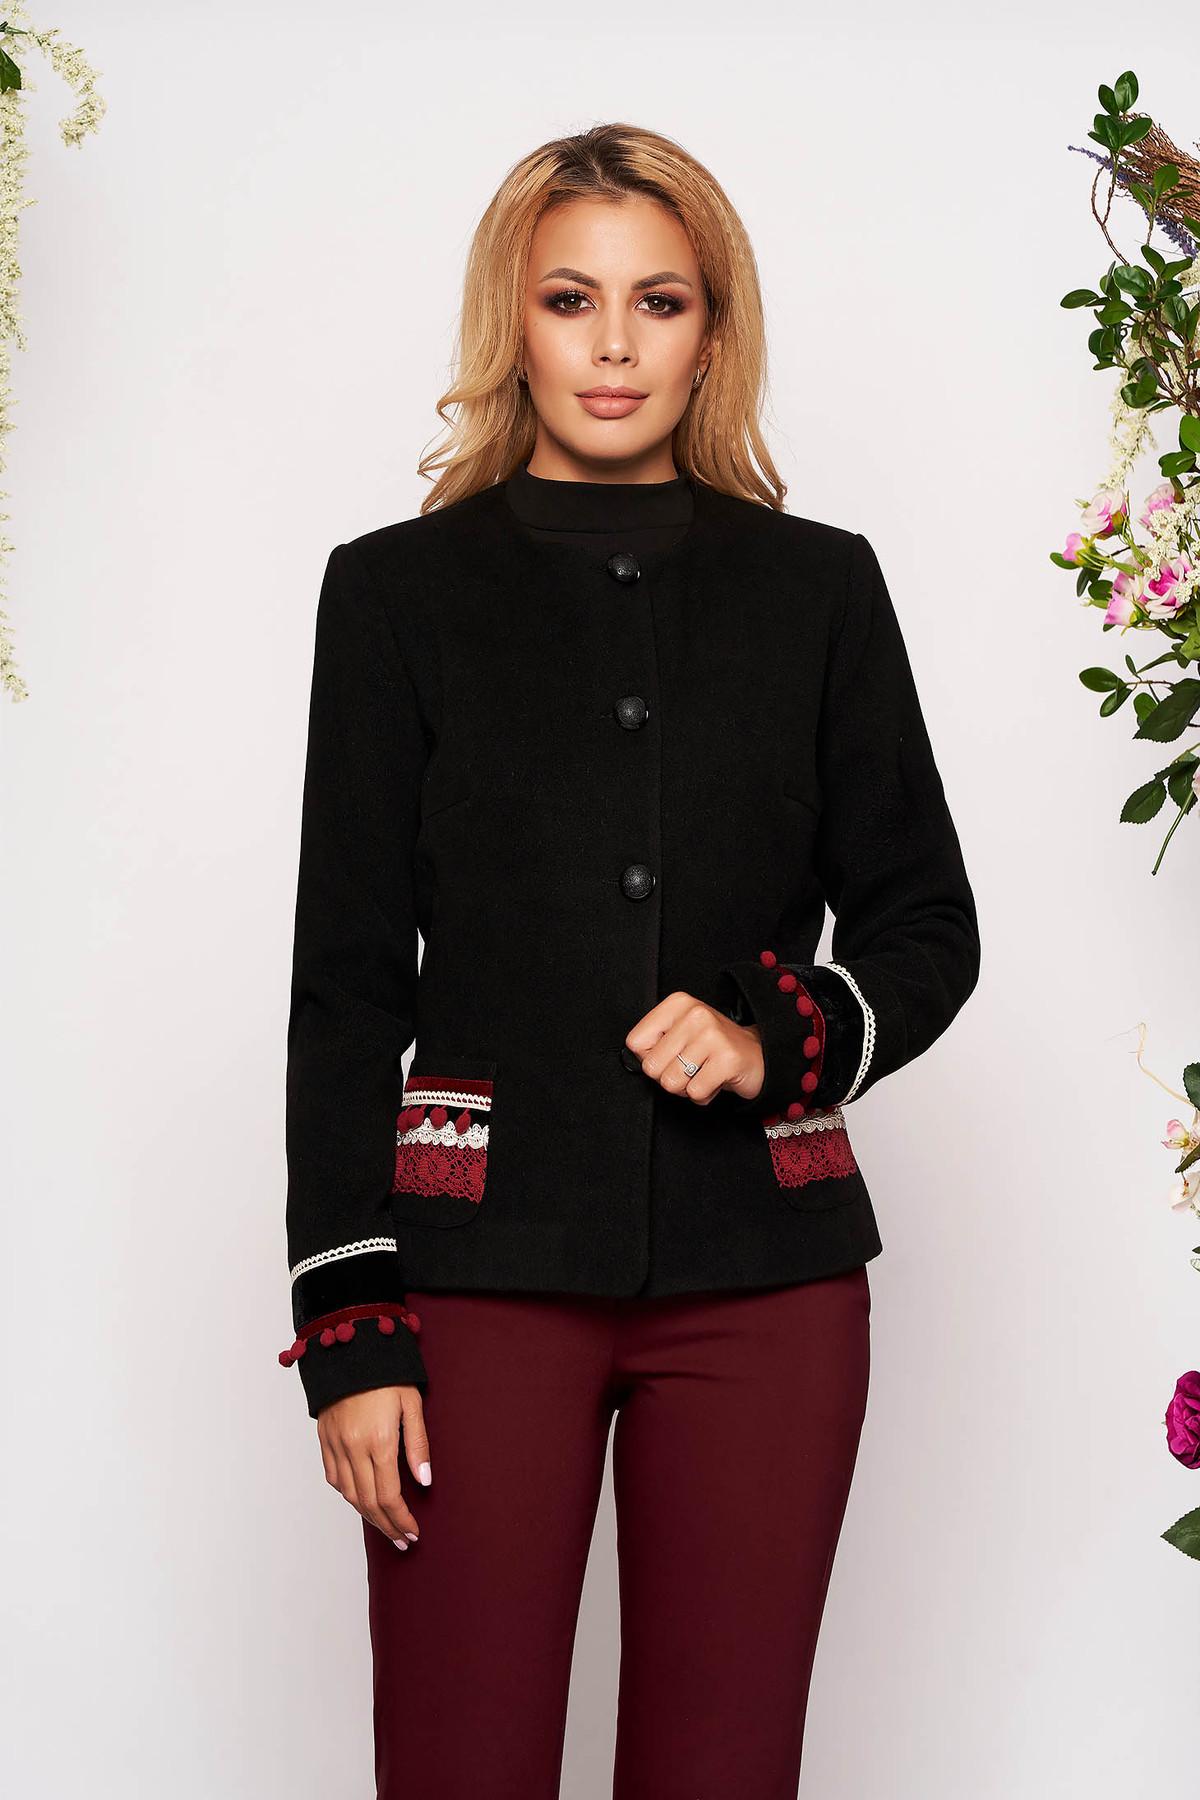 Sacou LaDonna negru din lana cambrat elegant tip blazer cu aplicatii cusute manual